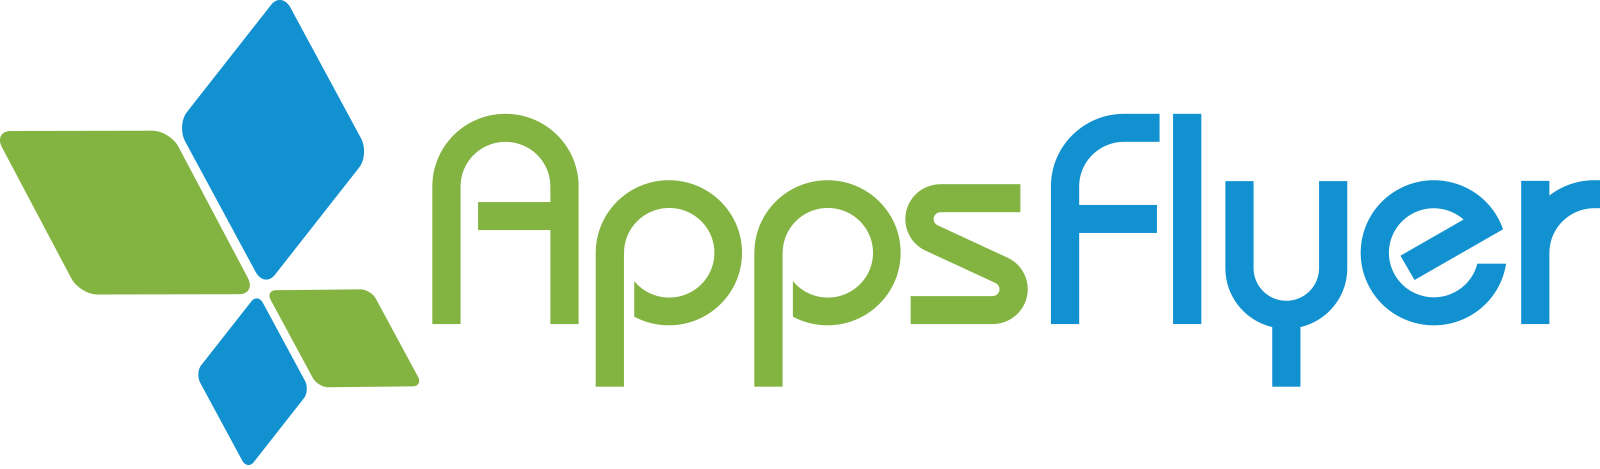 AppsFlyer $210m funding